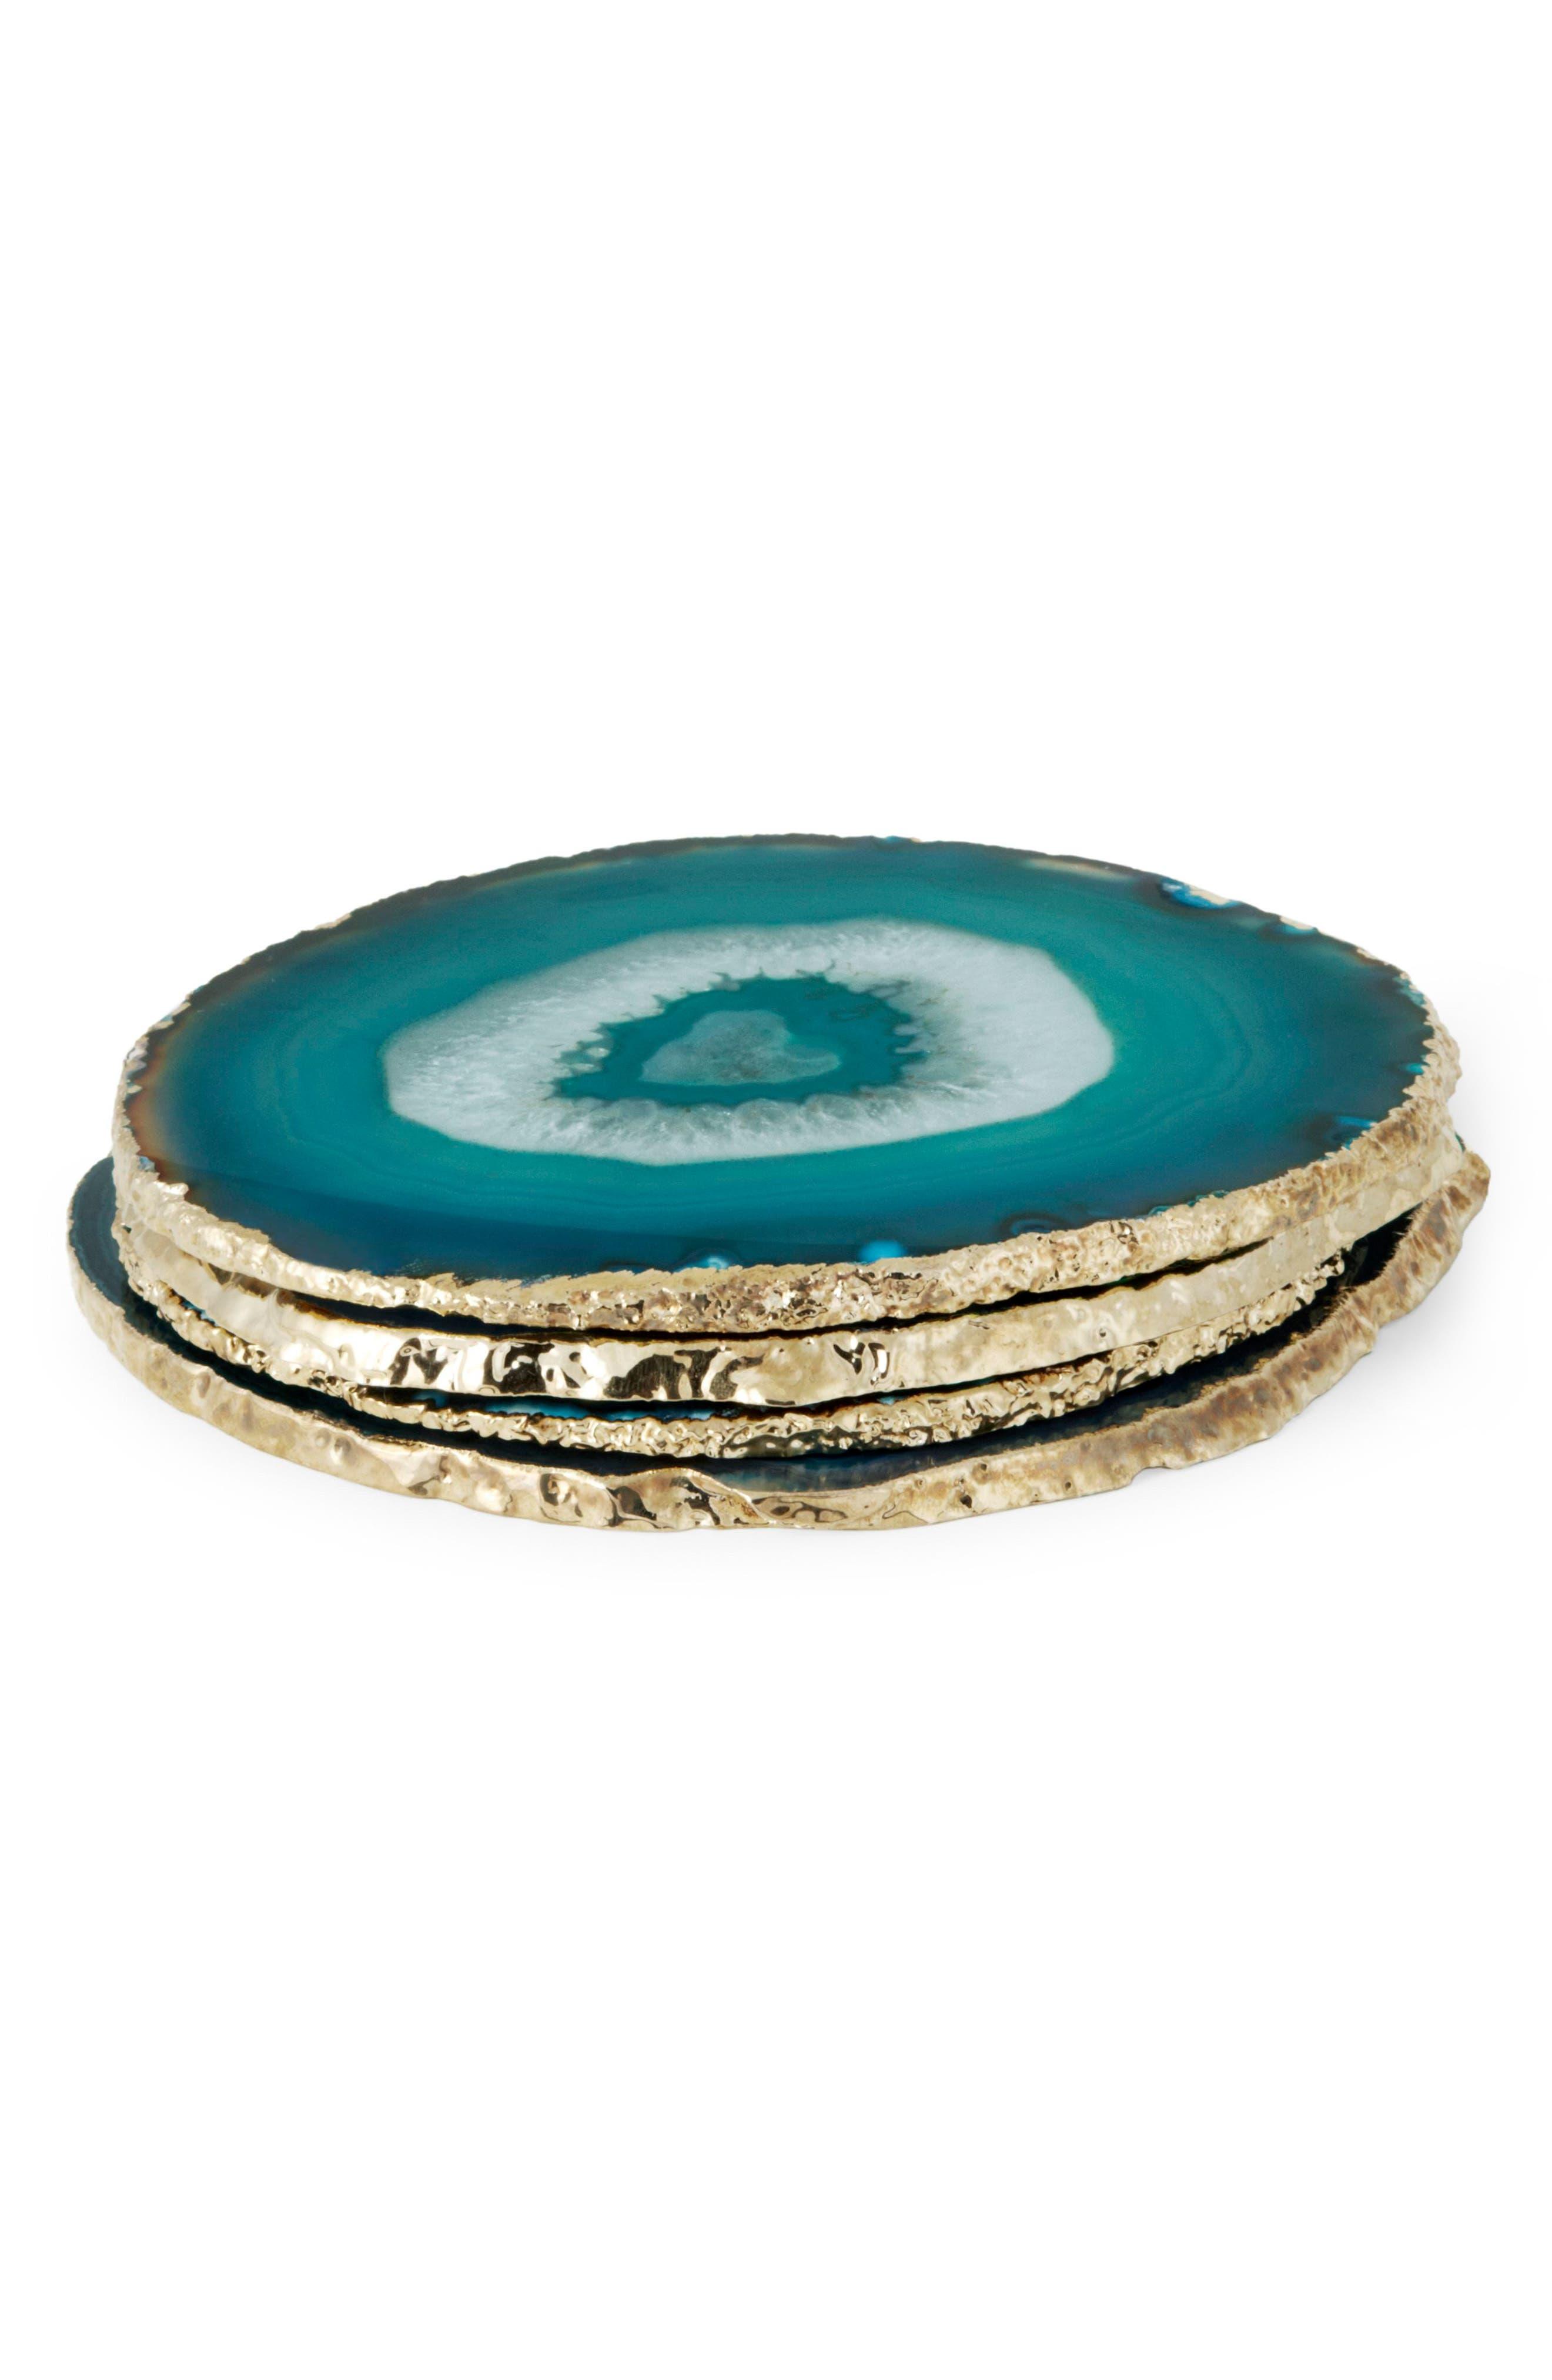 Set of 4 Agate Coasters,                             Main thumbnail 1, color,                             BLUE